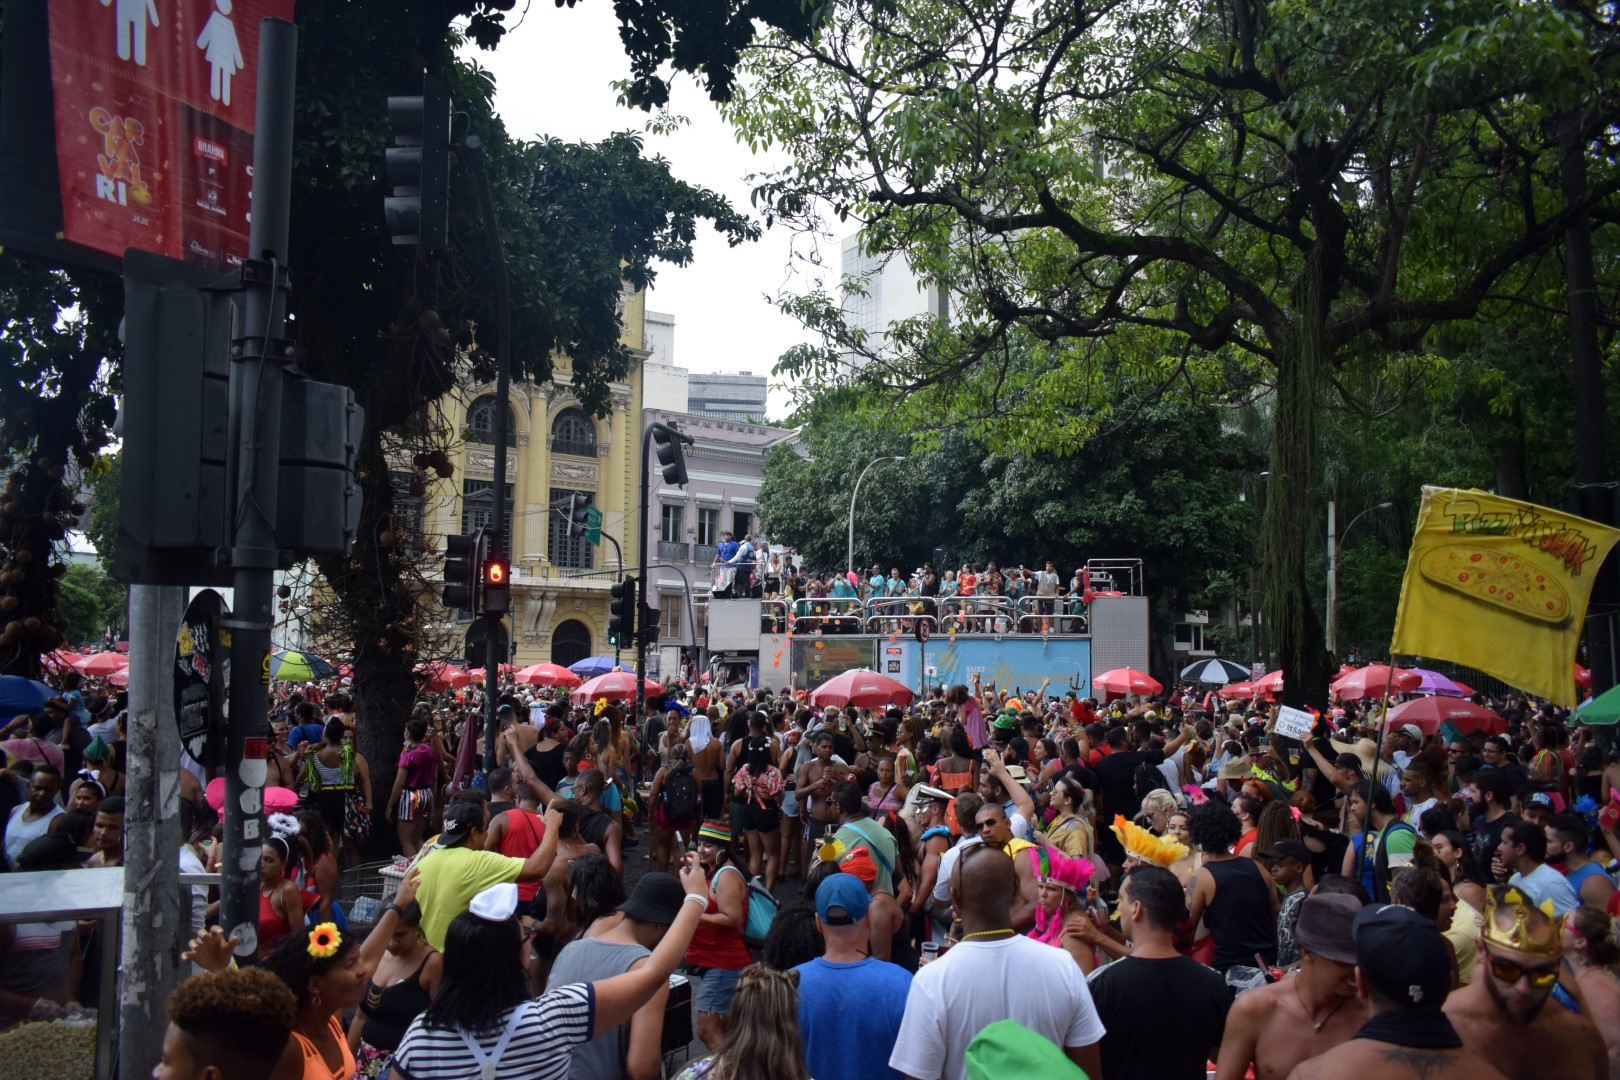 Bloco Quizomba, Lapa, Rio de Janeiro